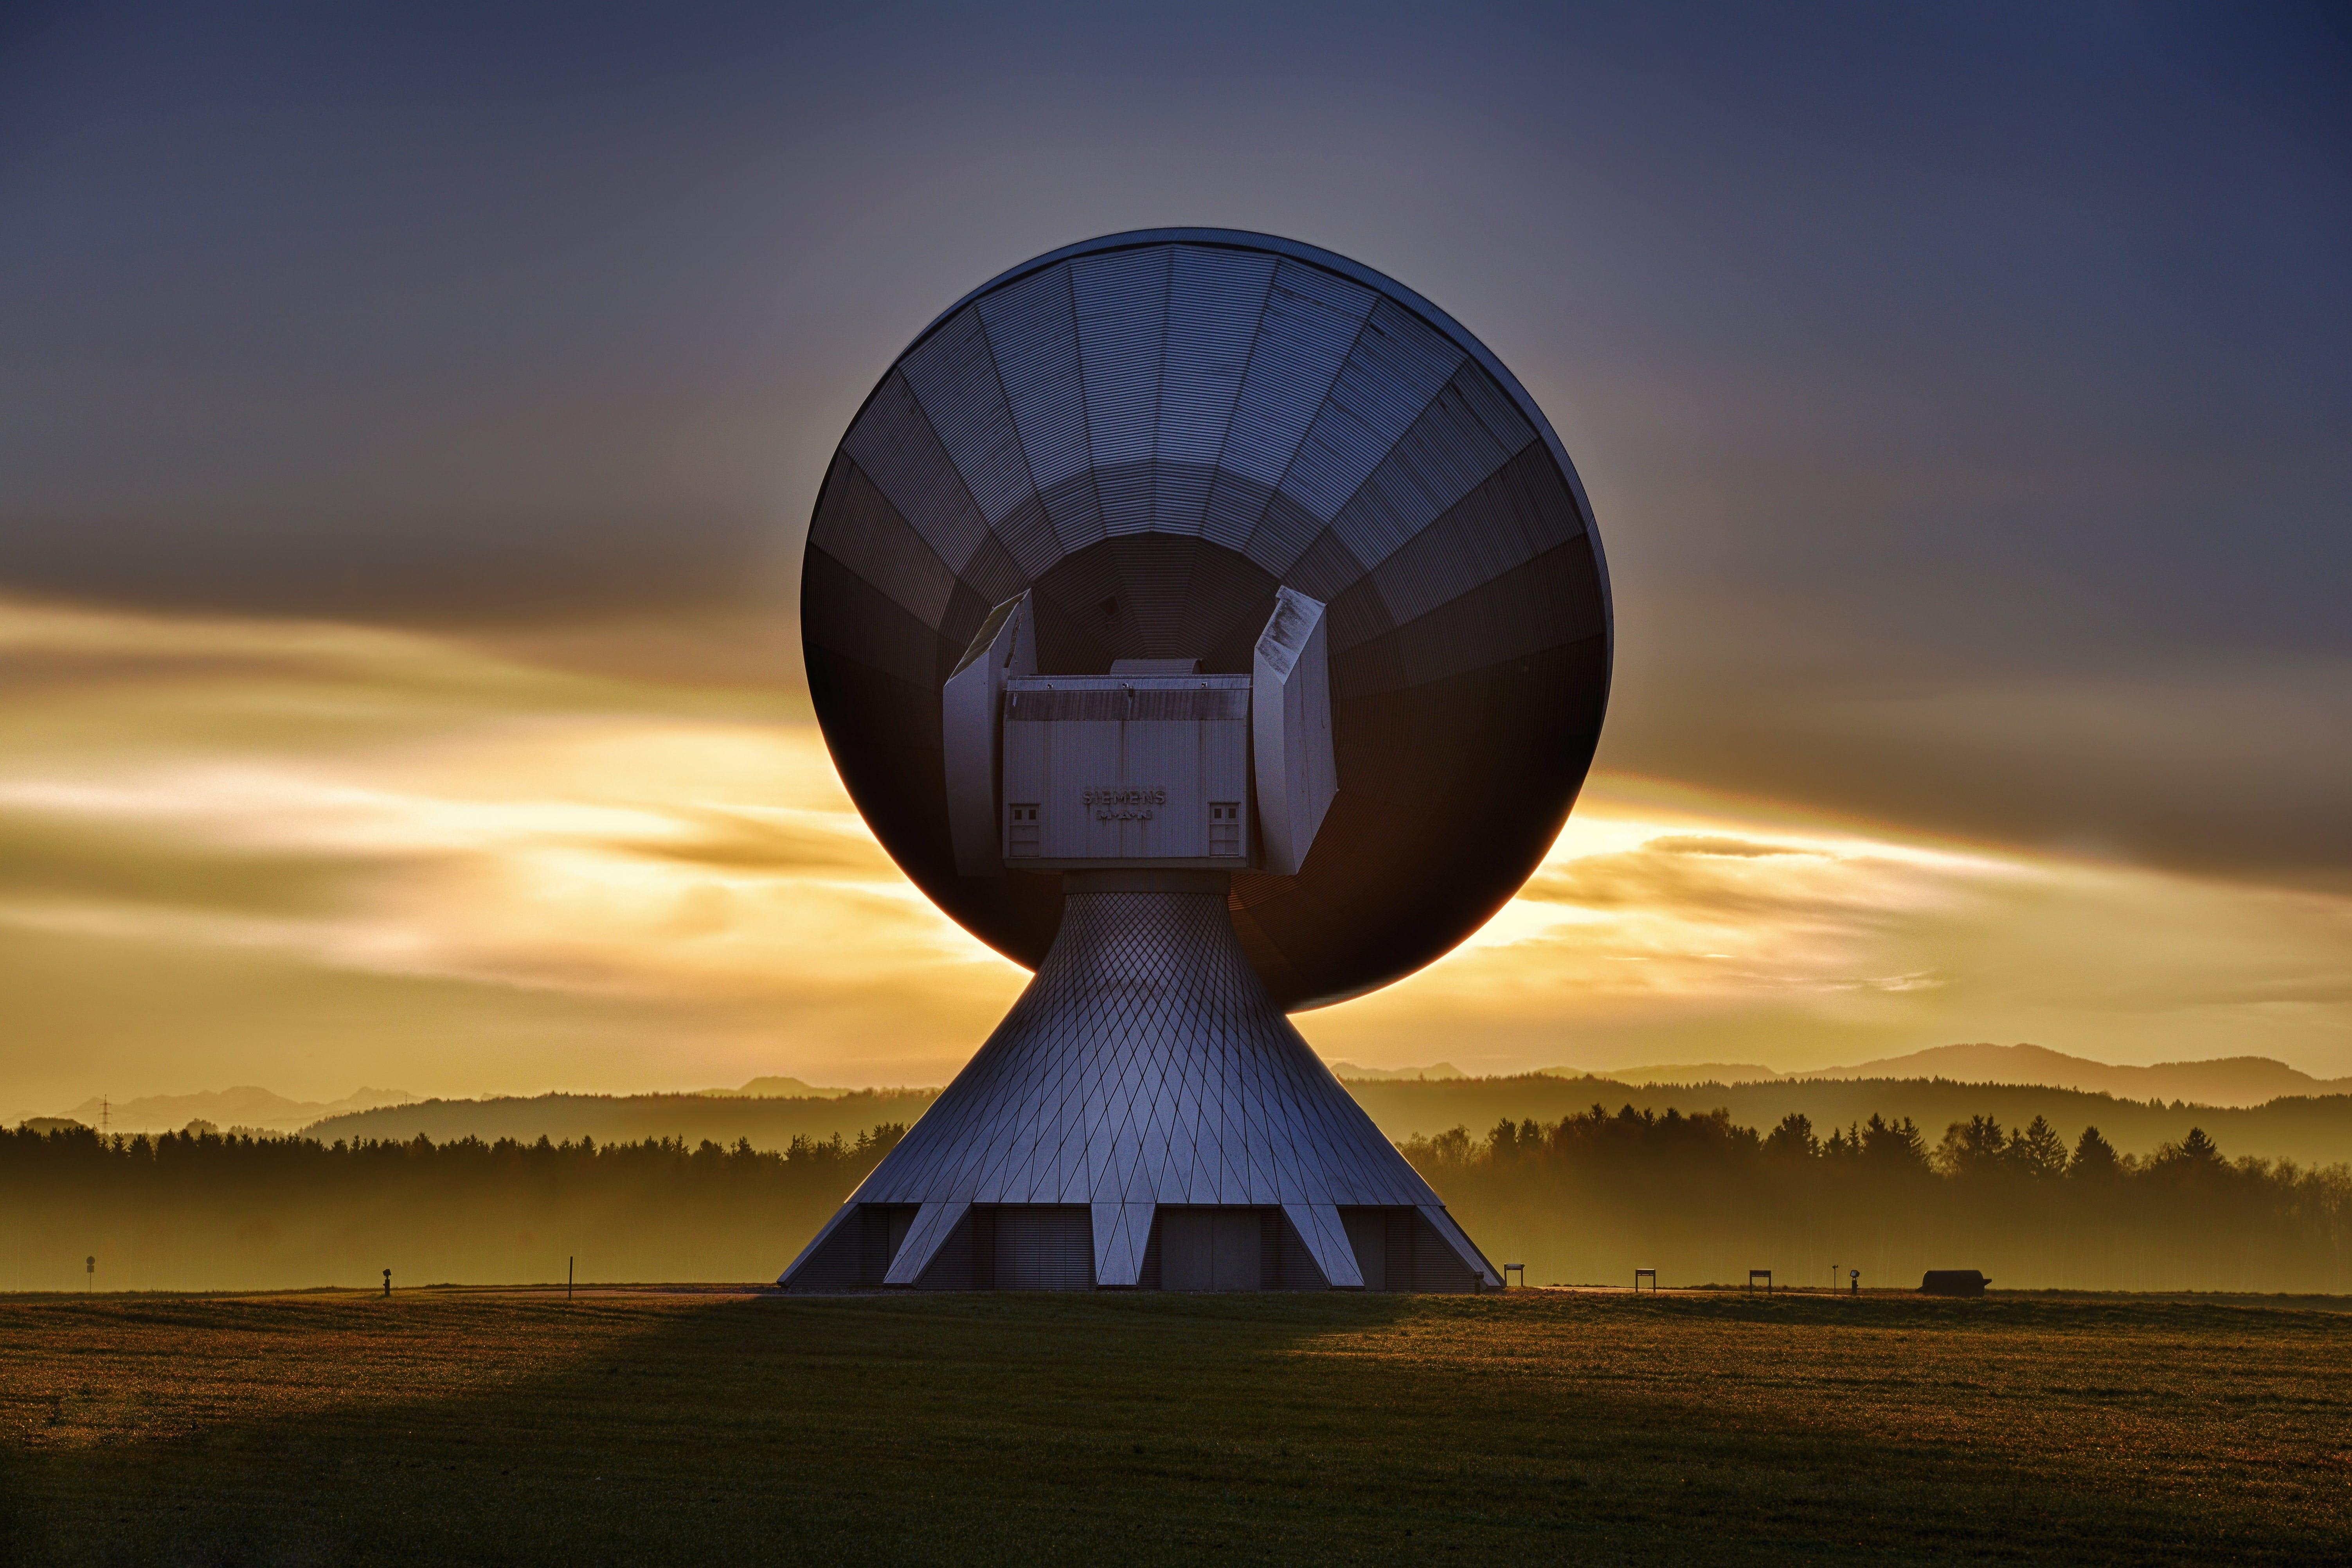 White Satellite Dish